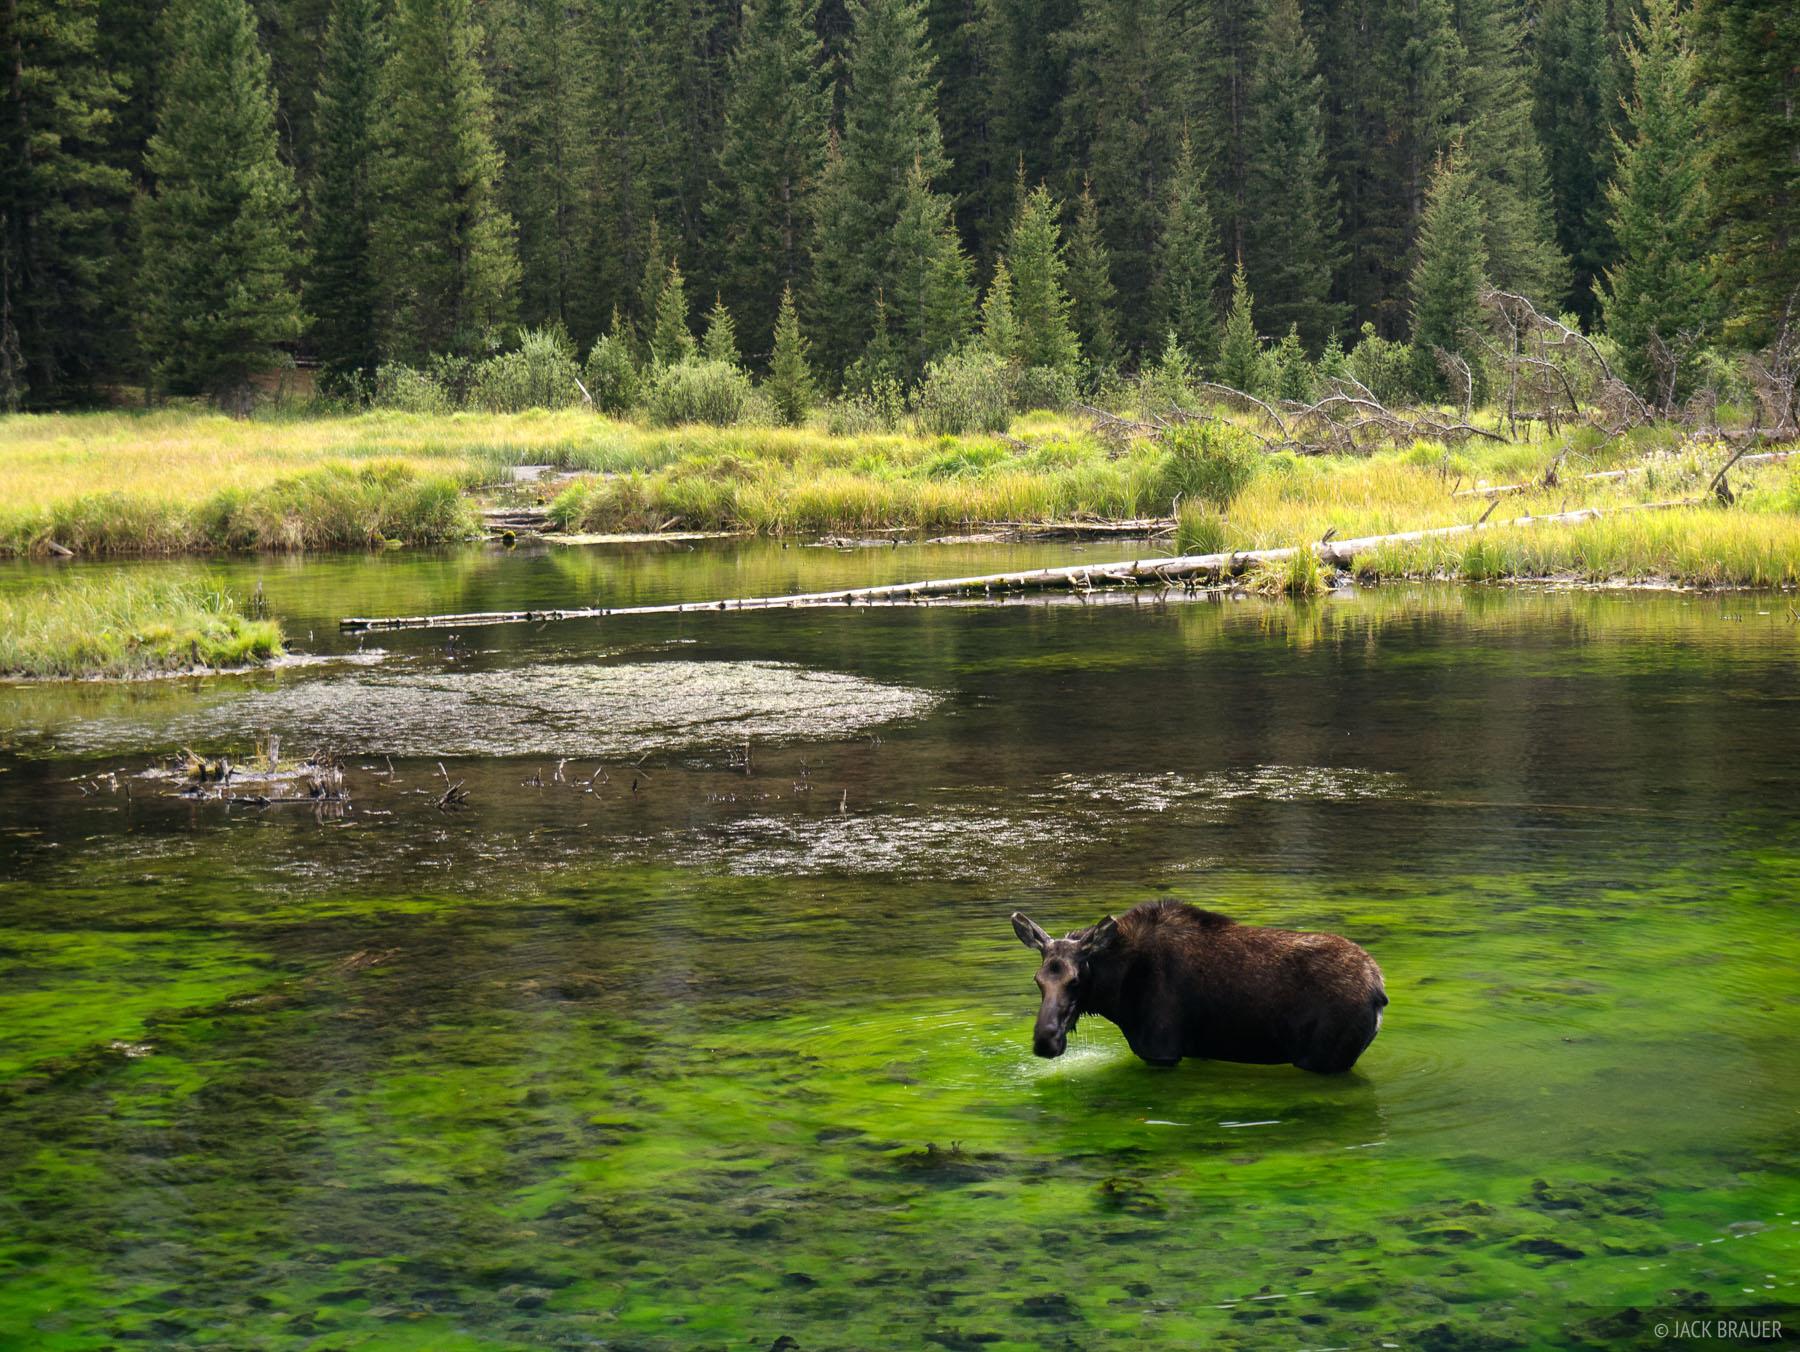 Moose, Elk Creek, Weminuche Wilderness, San Juan Mountains, Colorado, photo